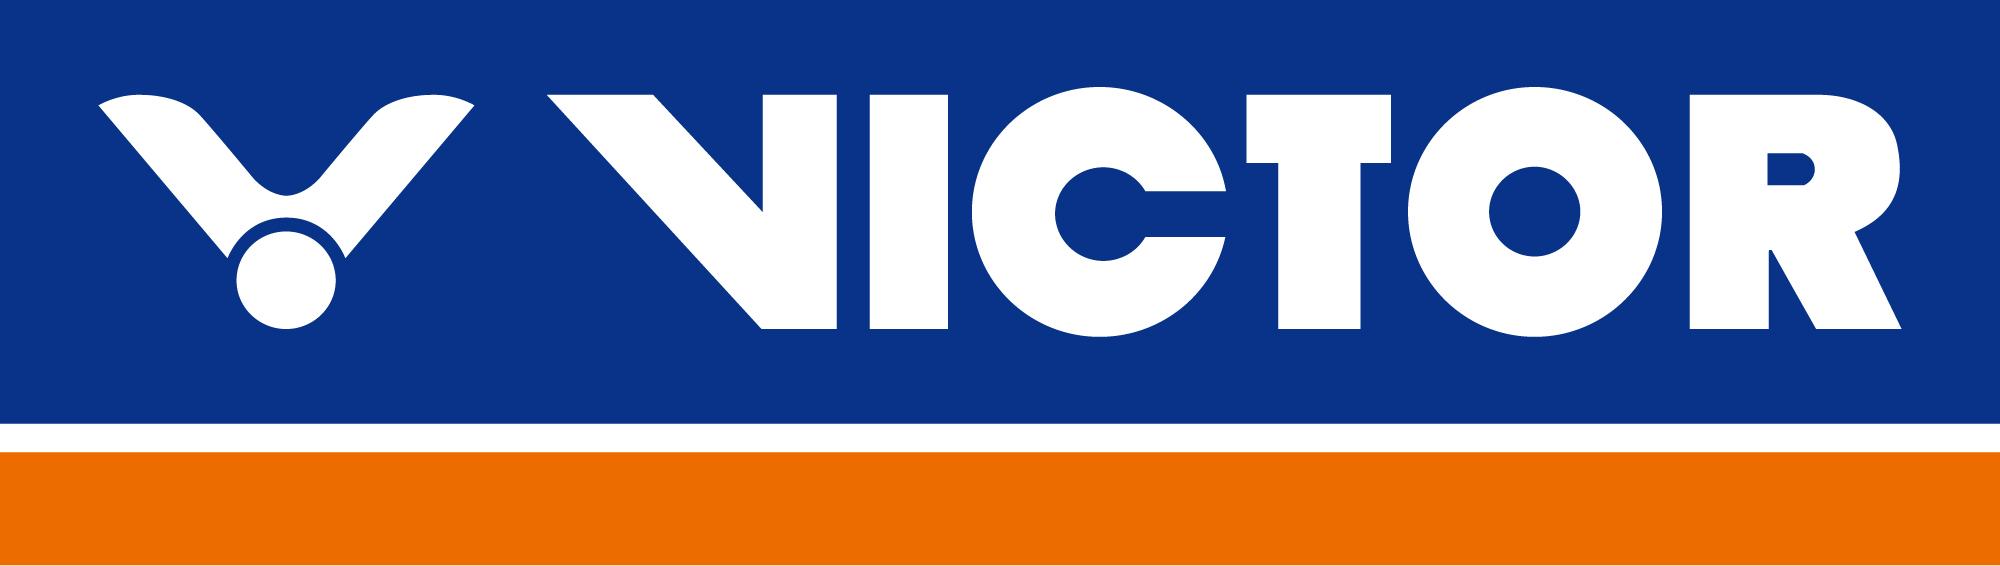 2016_victor_Logo